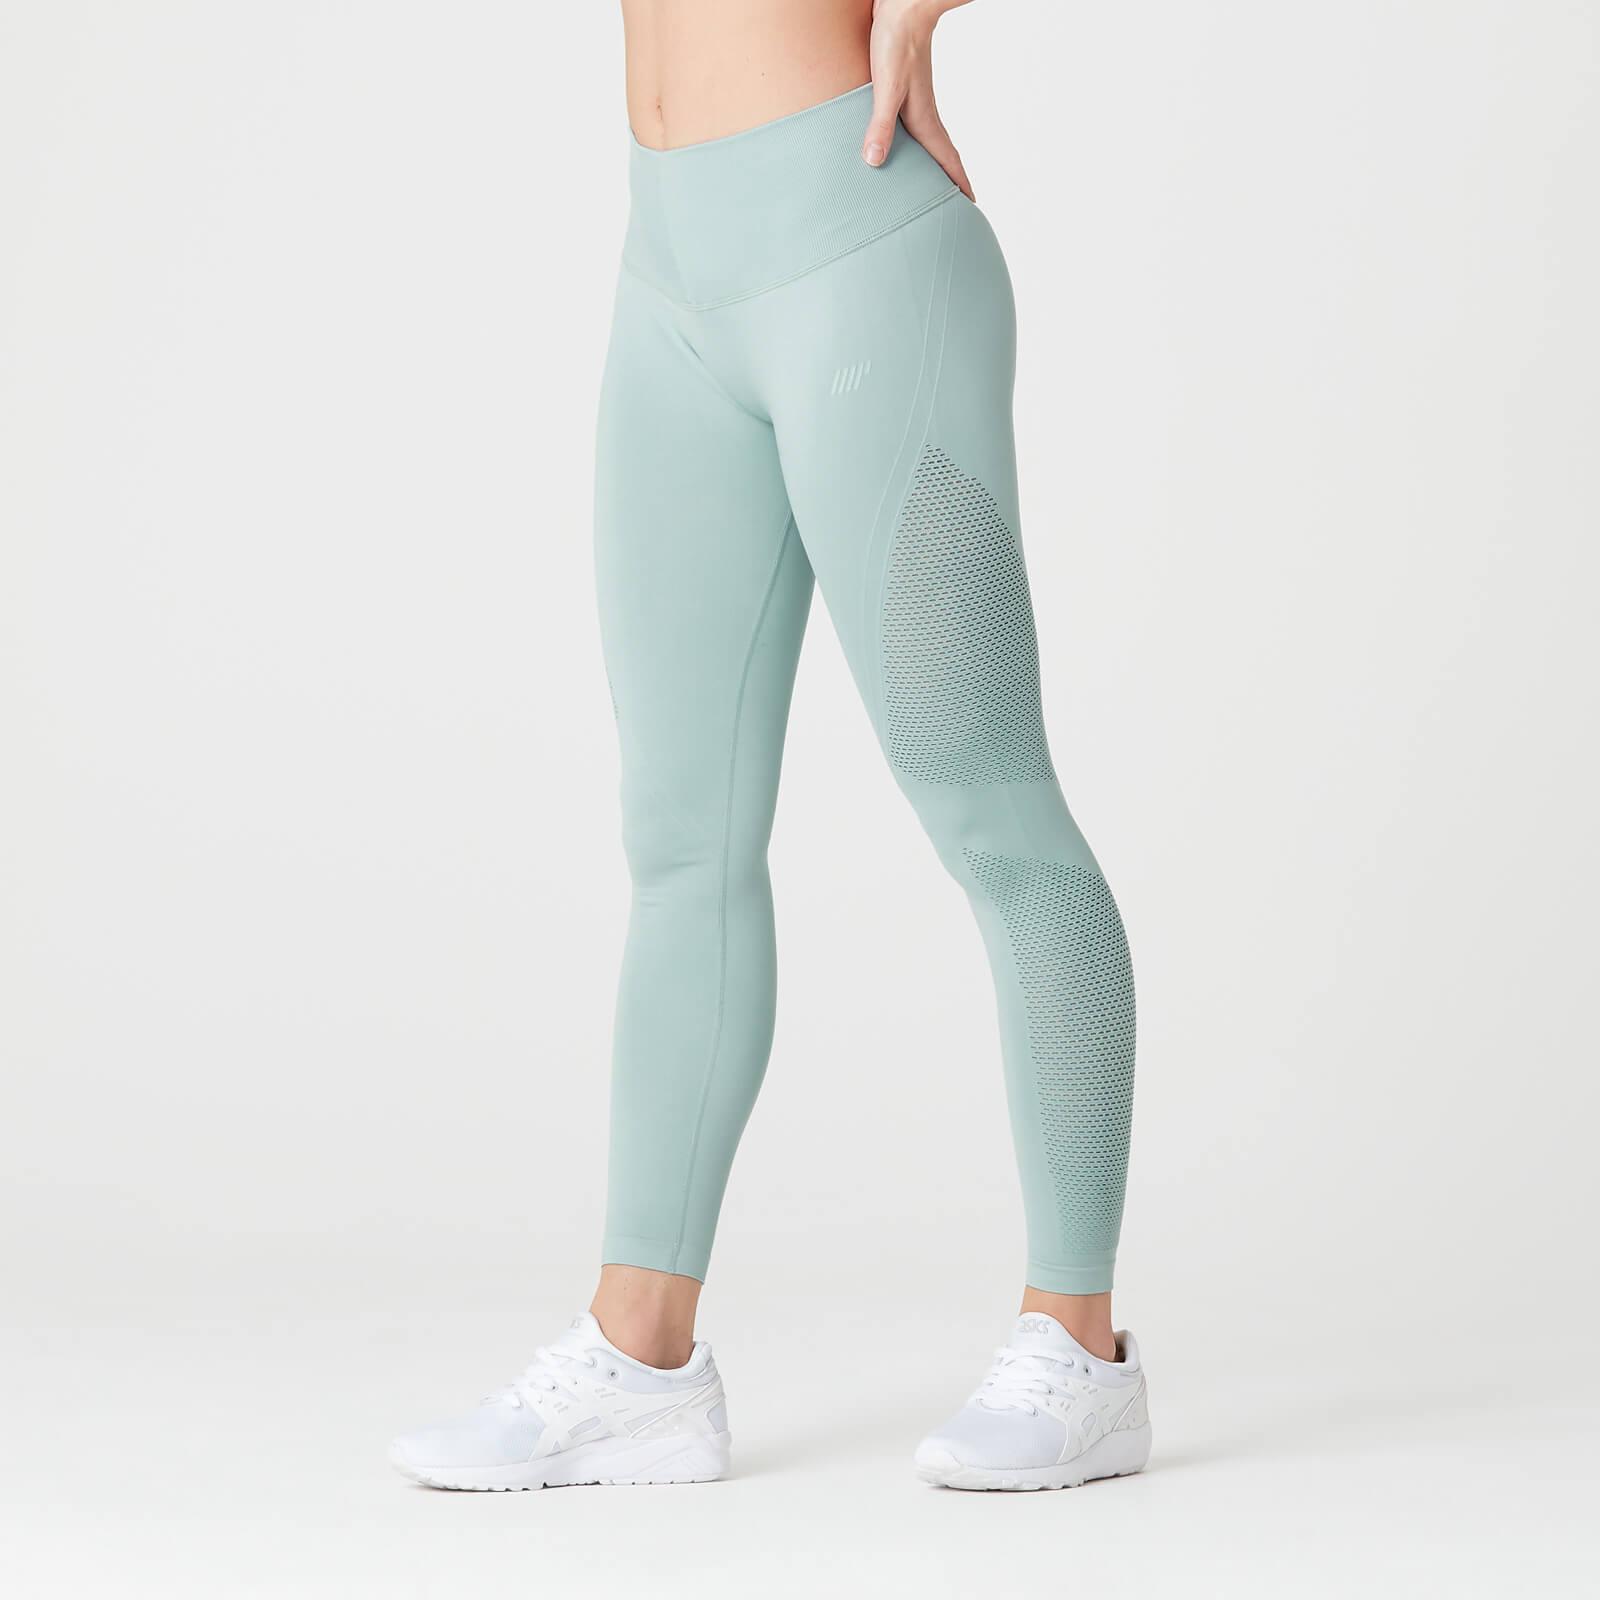 a916fd1b79878 Women's Shape Seamless Gym Leggings | Myprotein.com